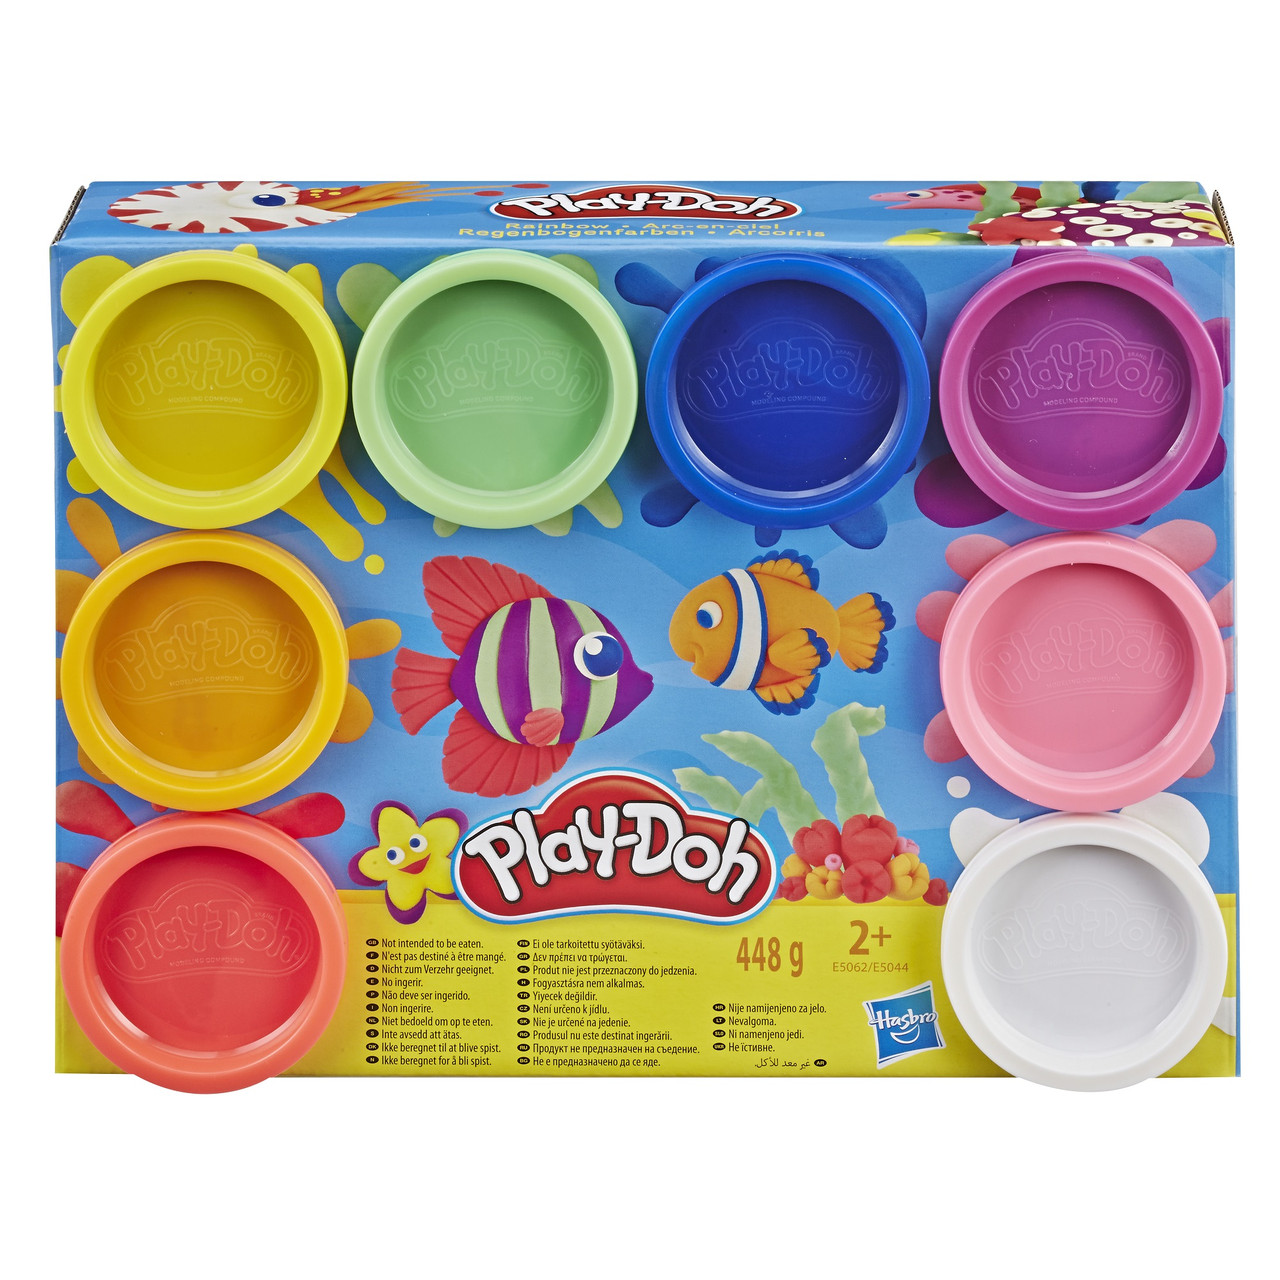 Игровой набор пластилина Play-doh Радуга 8 баночек 448 грамм. Оригинал Hasbro E5062/E5044